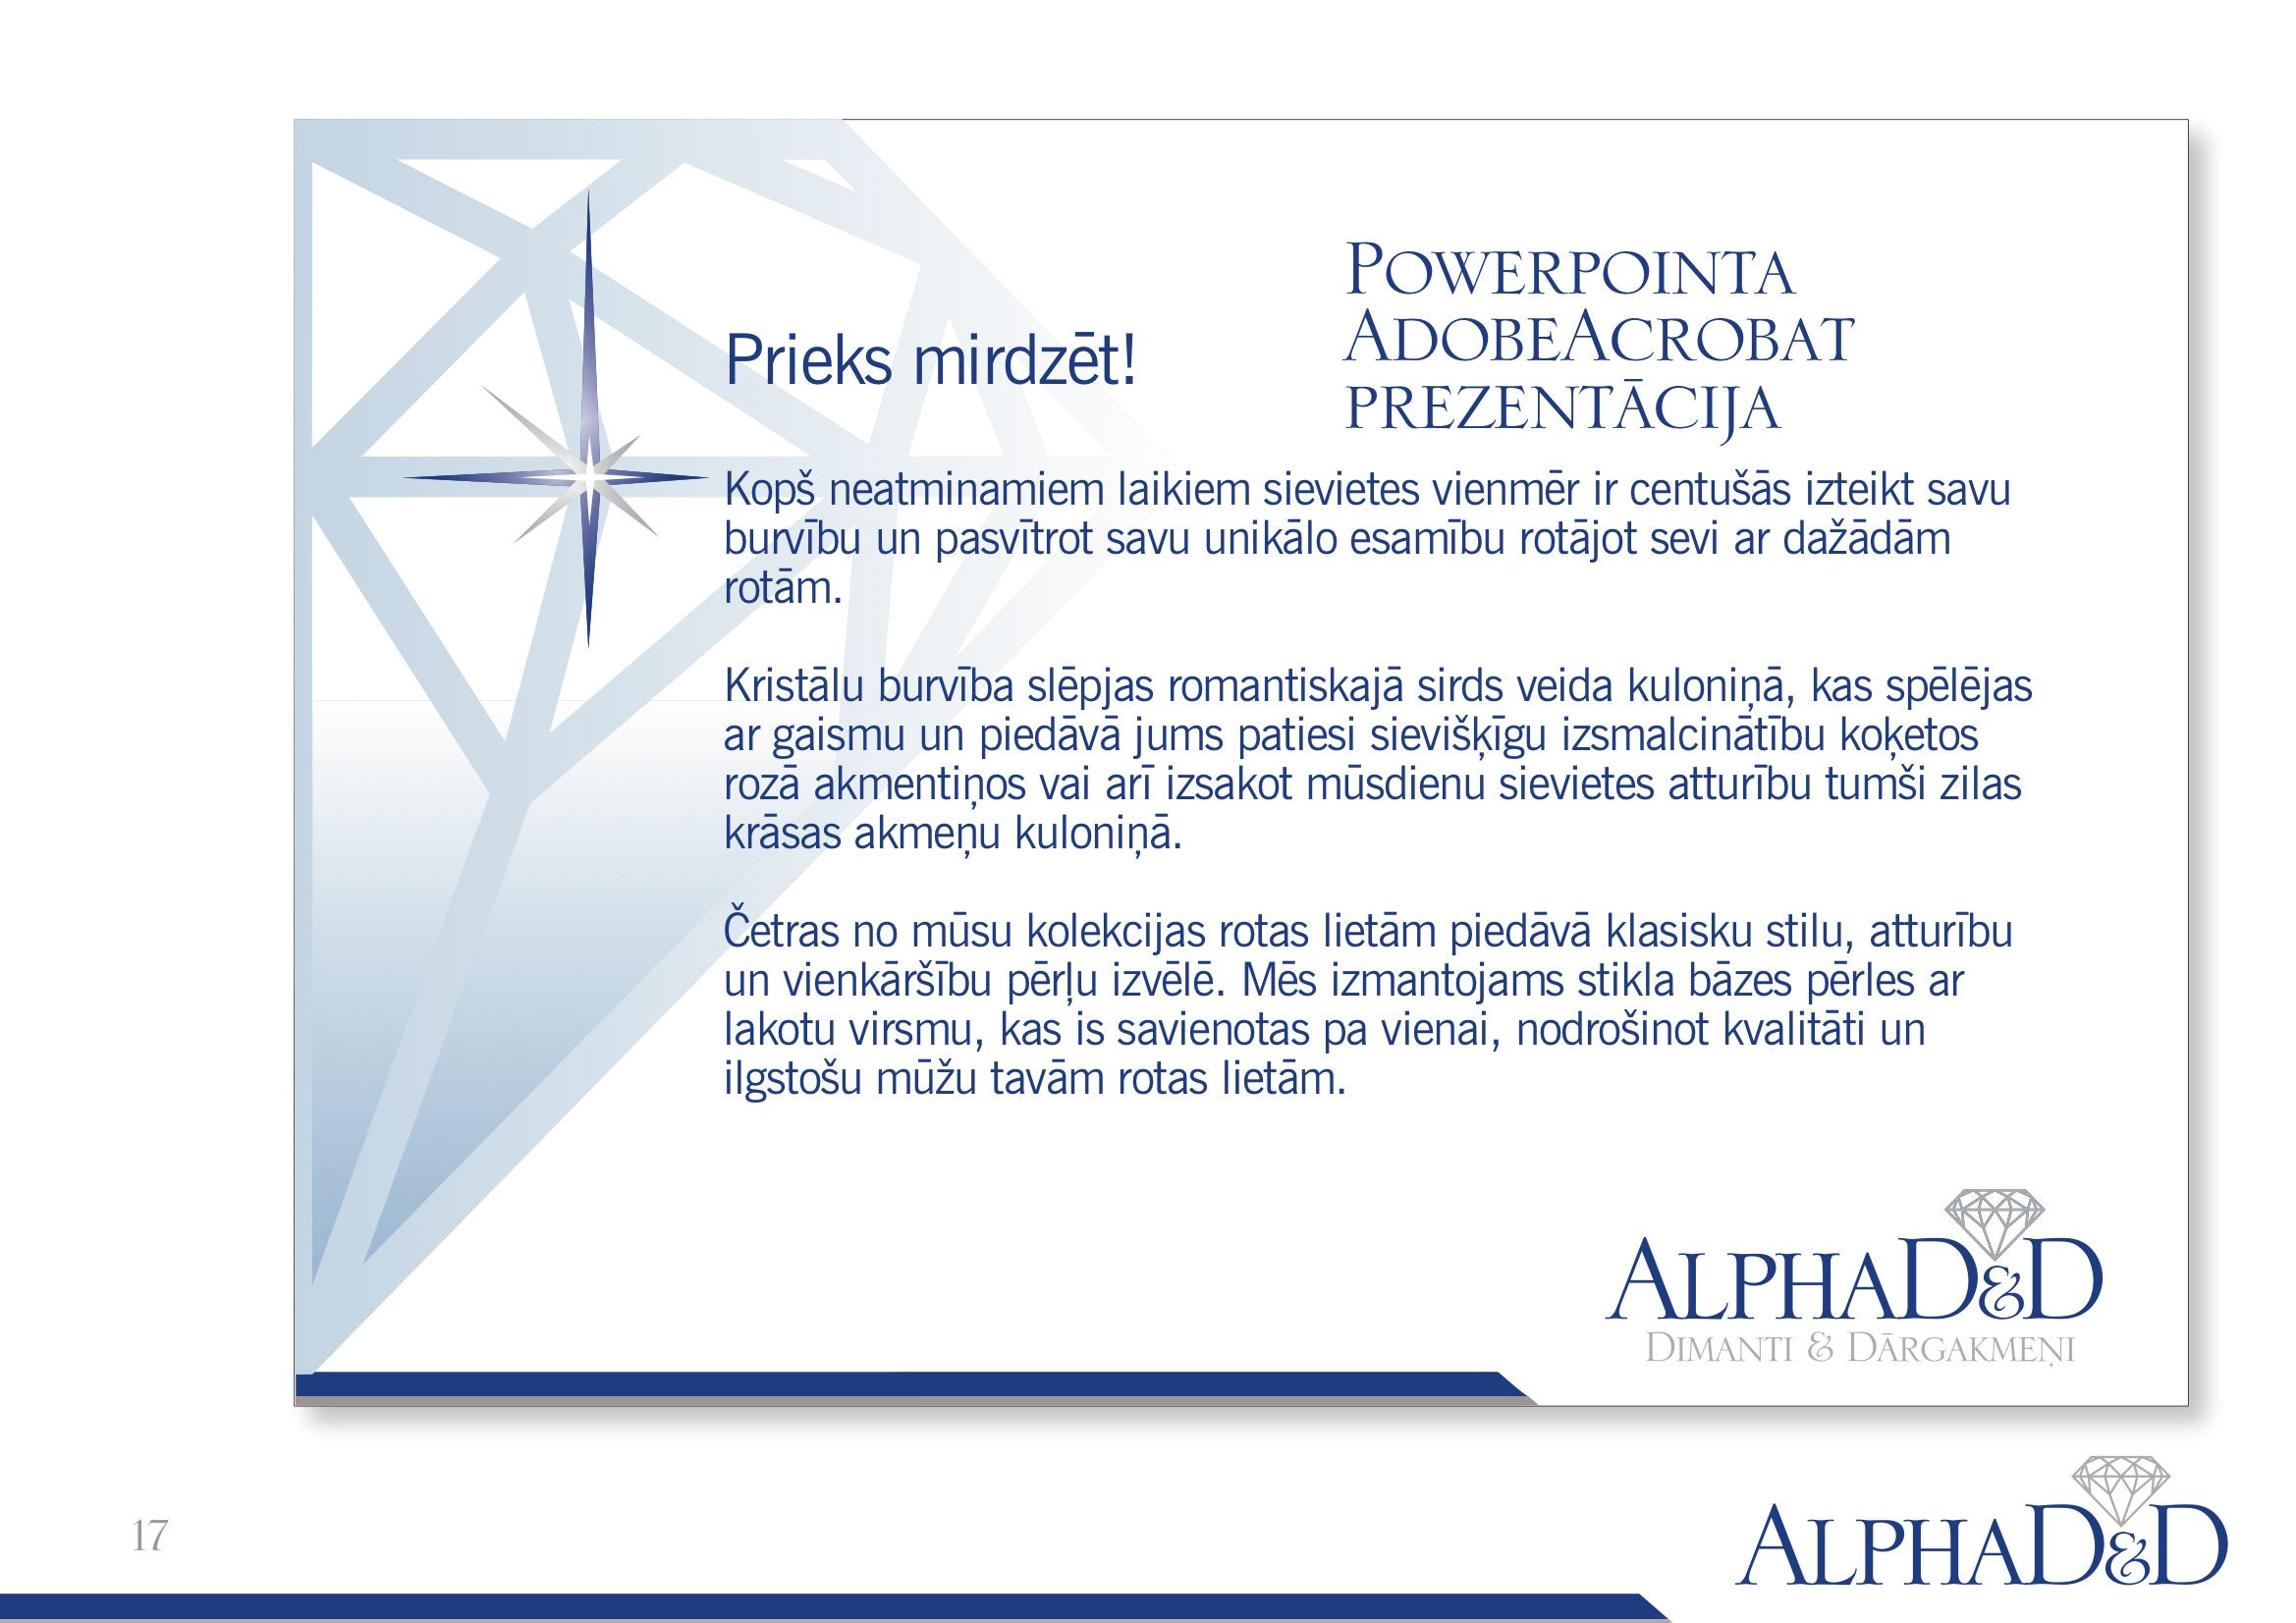 AlphaDD_Stils 17